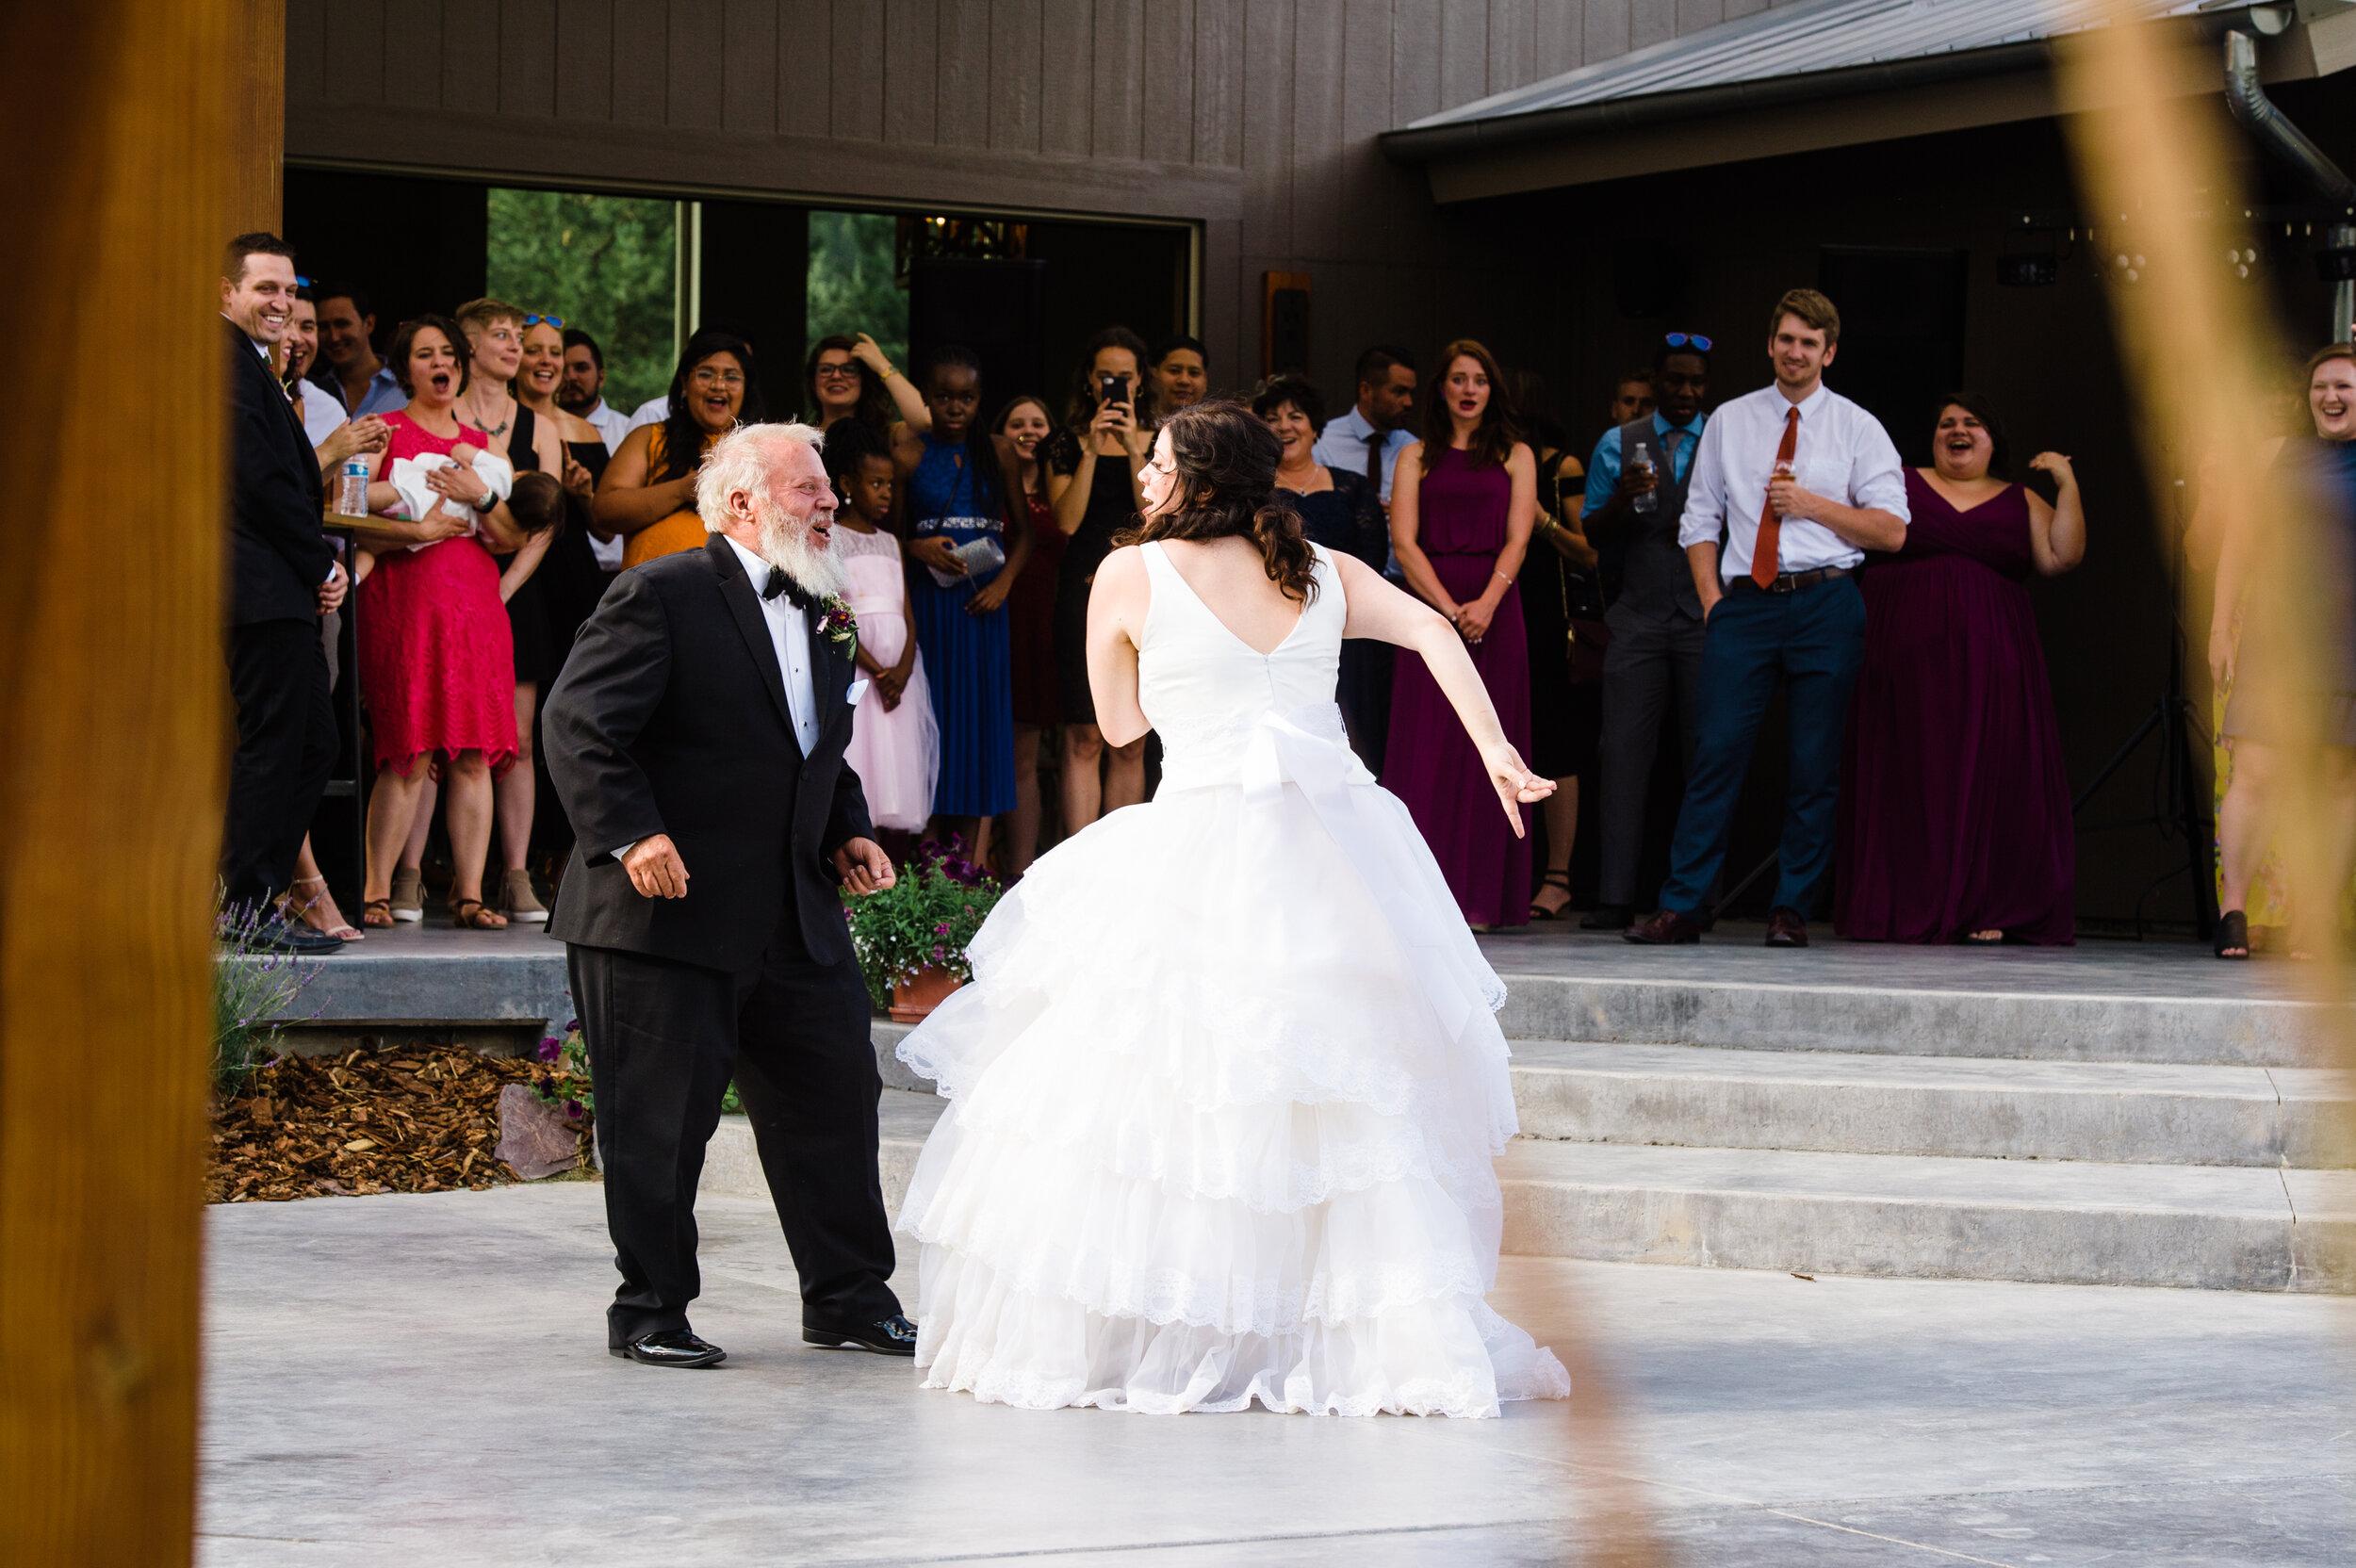 722White Raven Wedding_Montana Wedding Photographer_Rebekah & Likom_Honeybee Weddings_July 27, 2019-1226.jpg